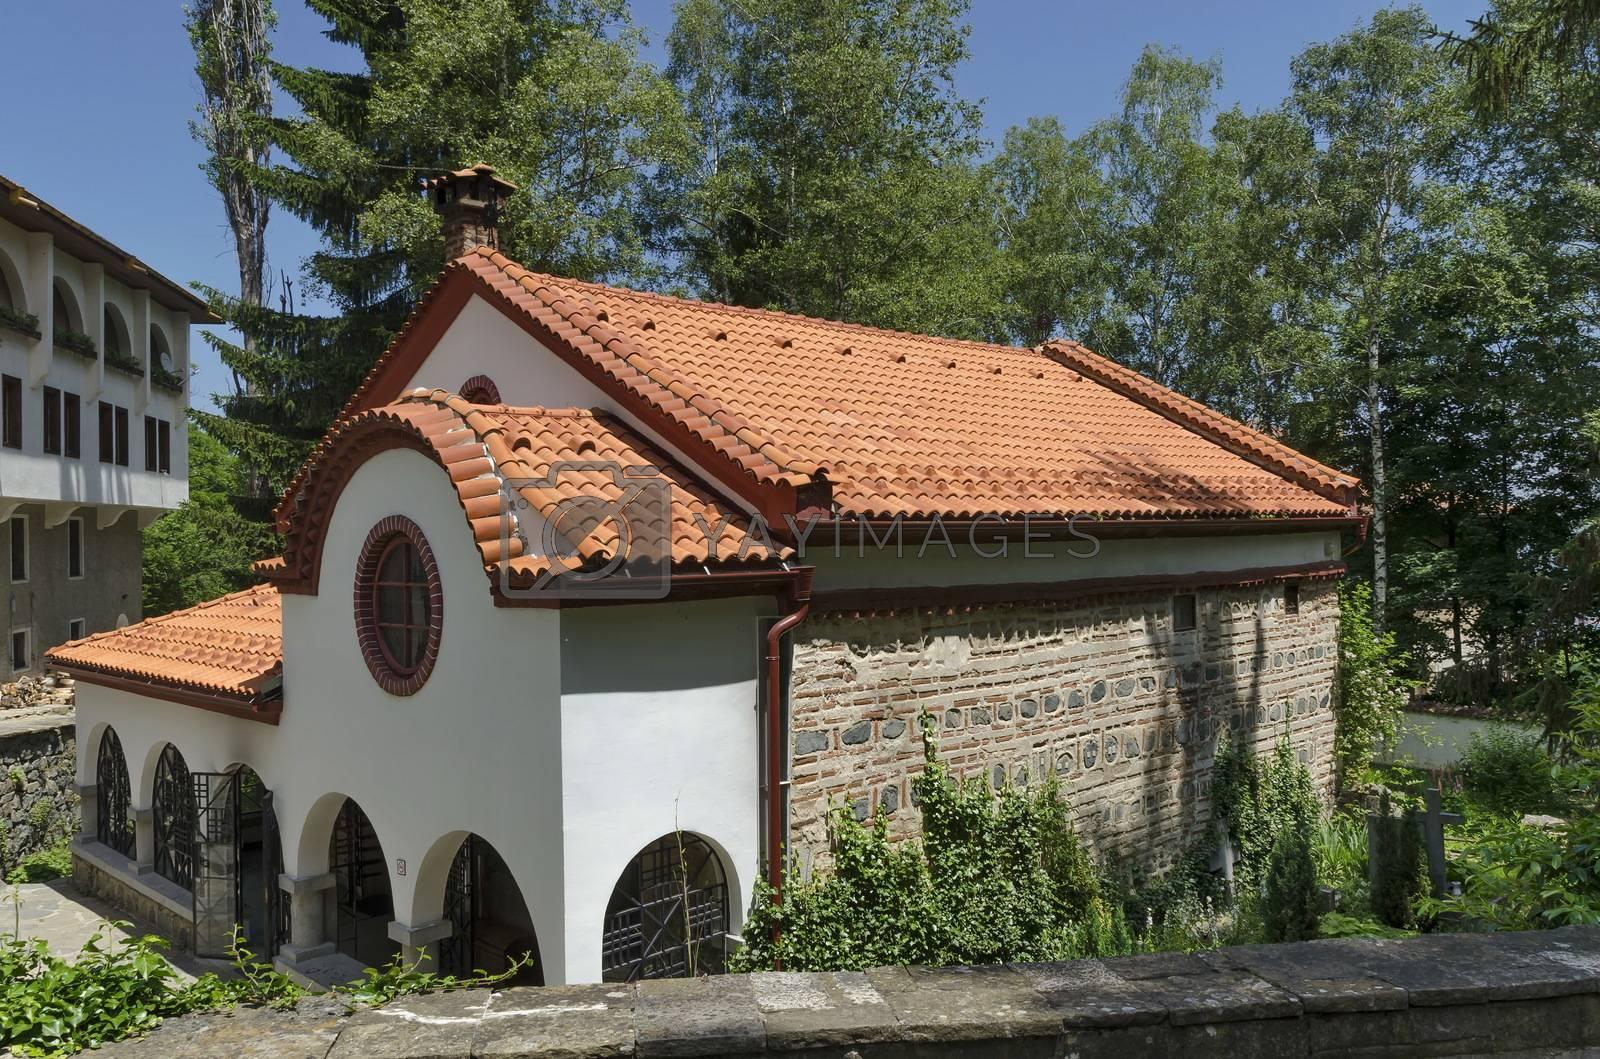 Royalty free image of Dragalevtsi Monastery, Vitosha mountain by intsys